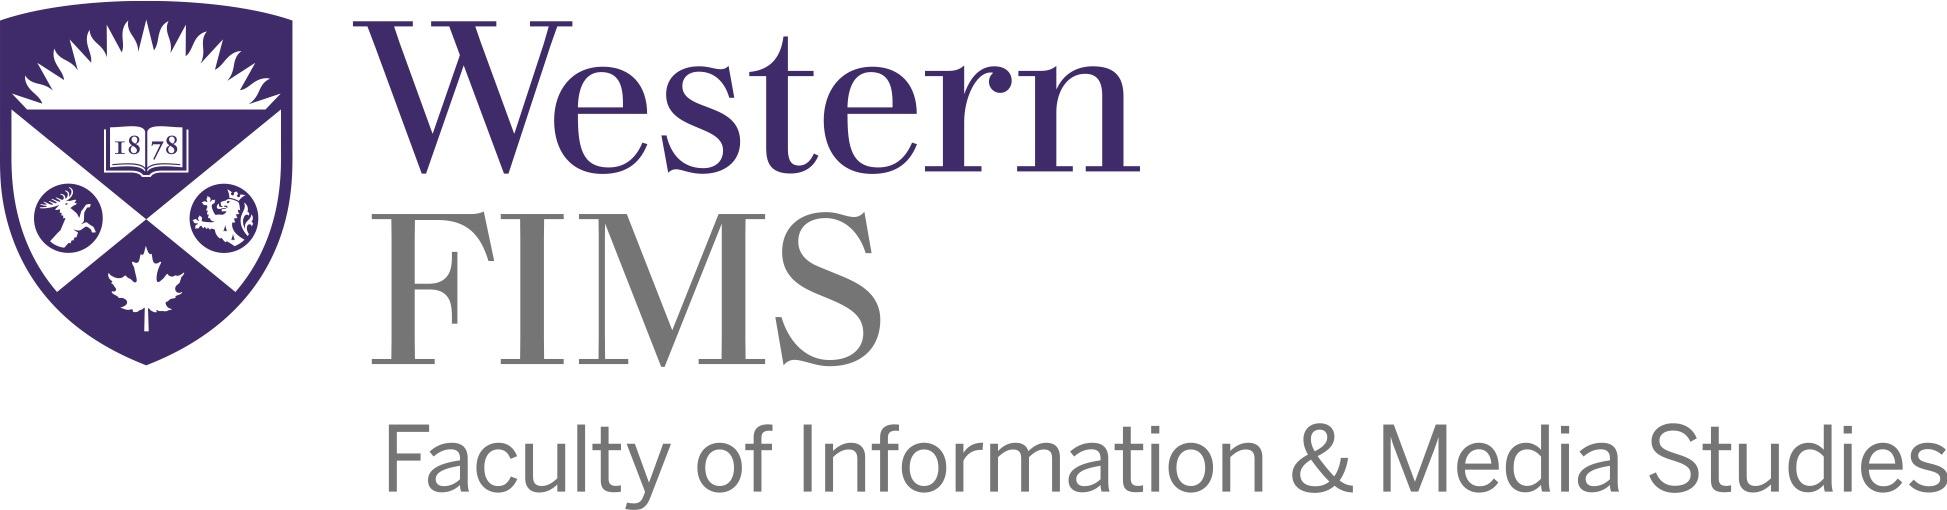 Western Alumni News